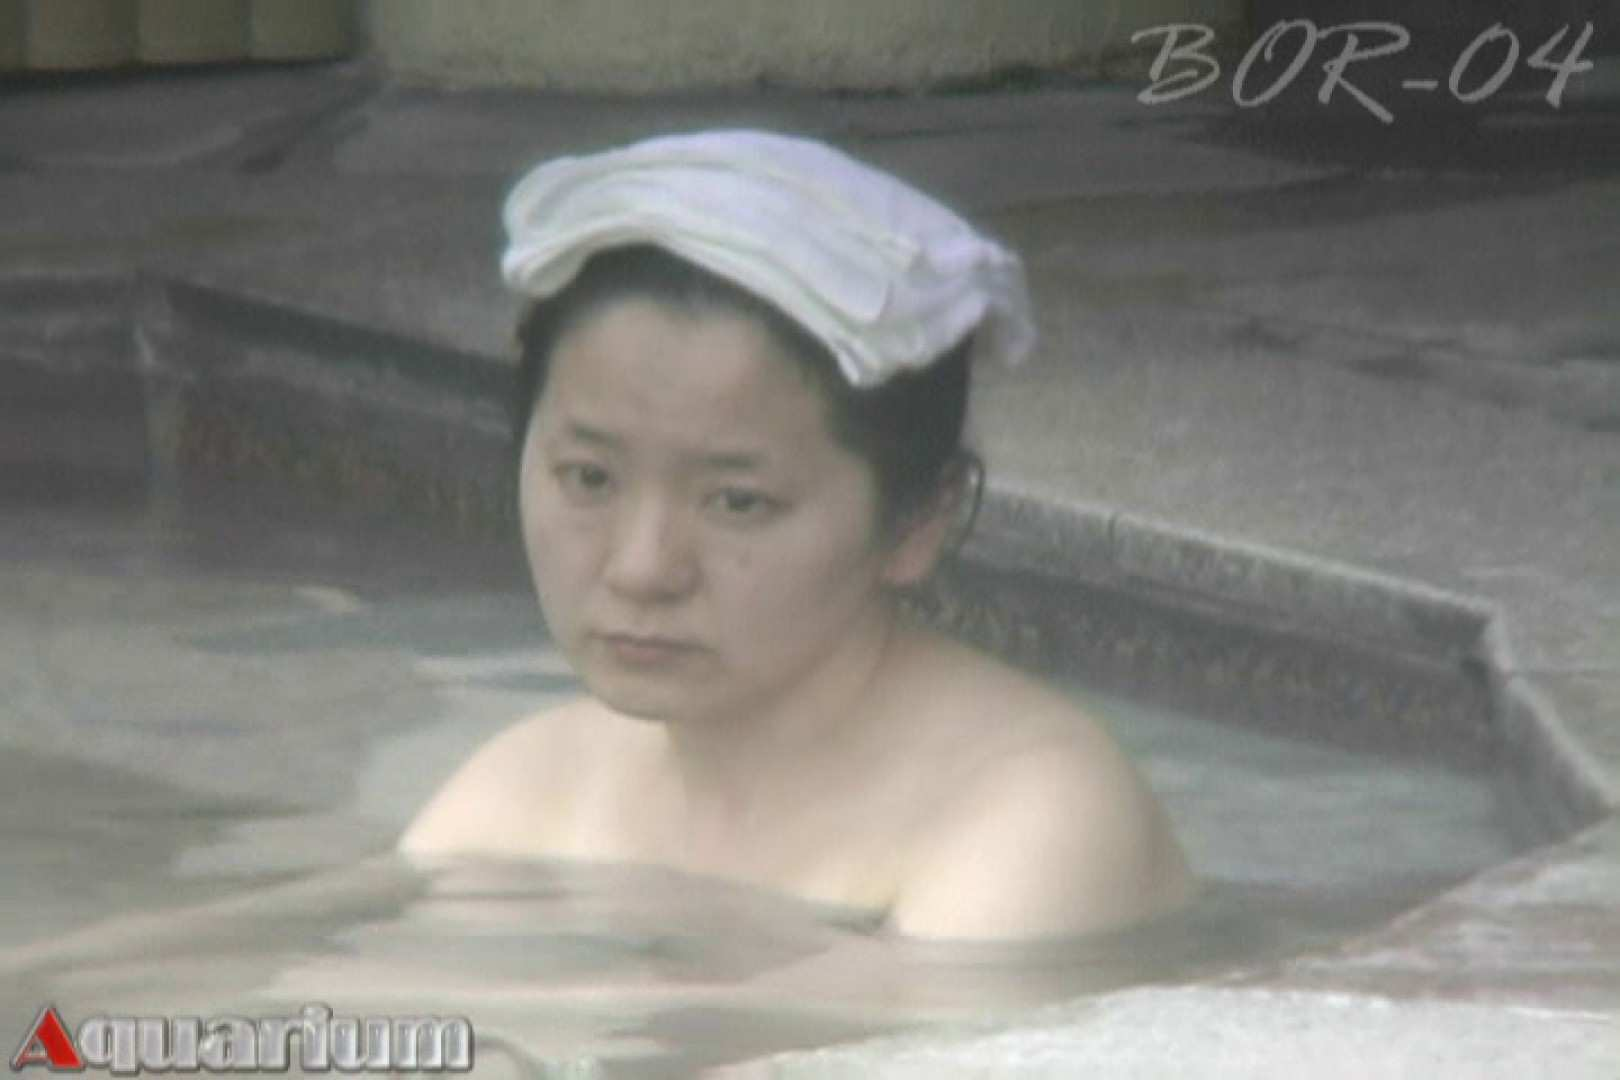 Aquaな露天風呂Vol.506 OLのエロ生活 | 露天風呂  99連発 37